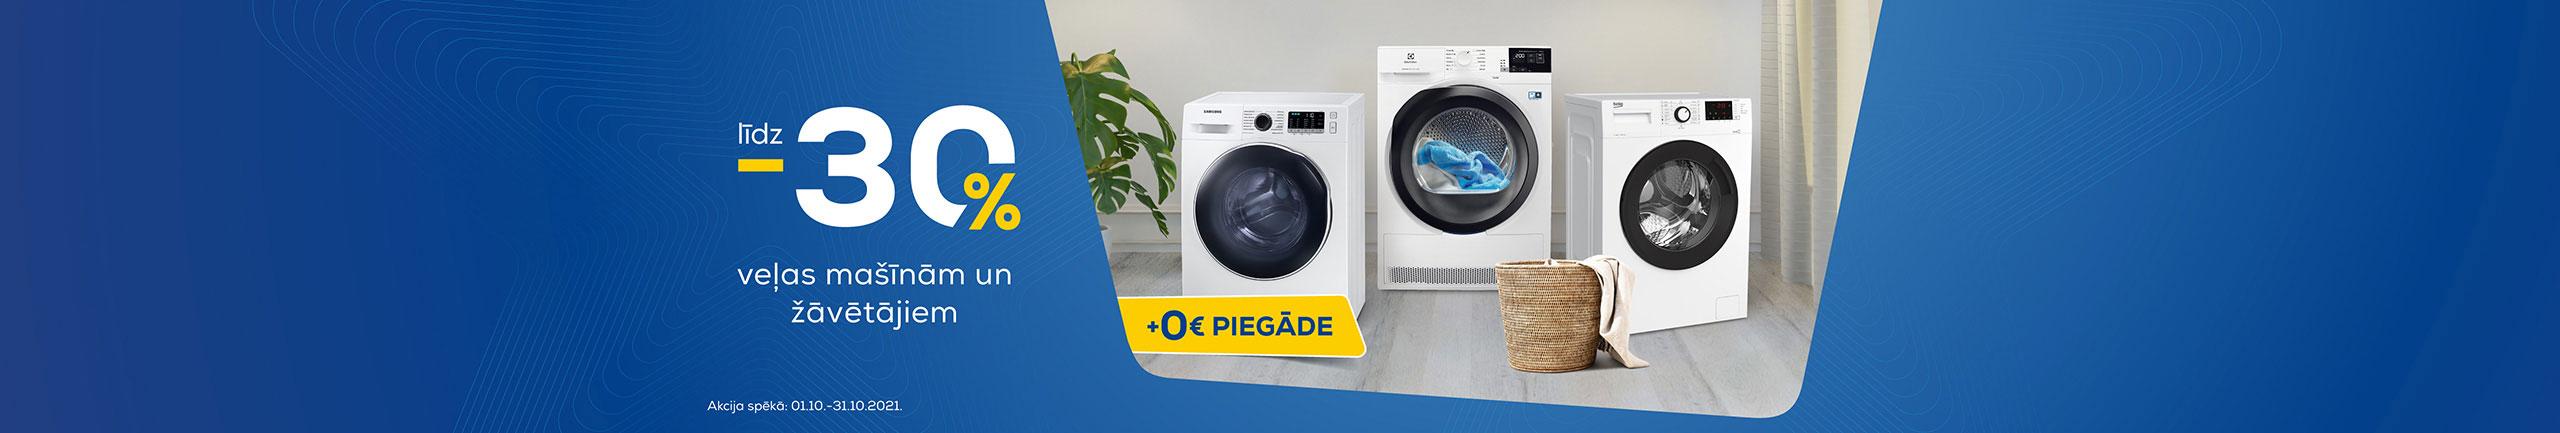 PL Wash Dry